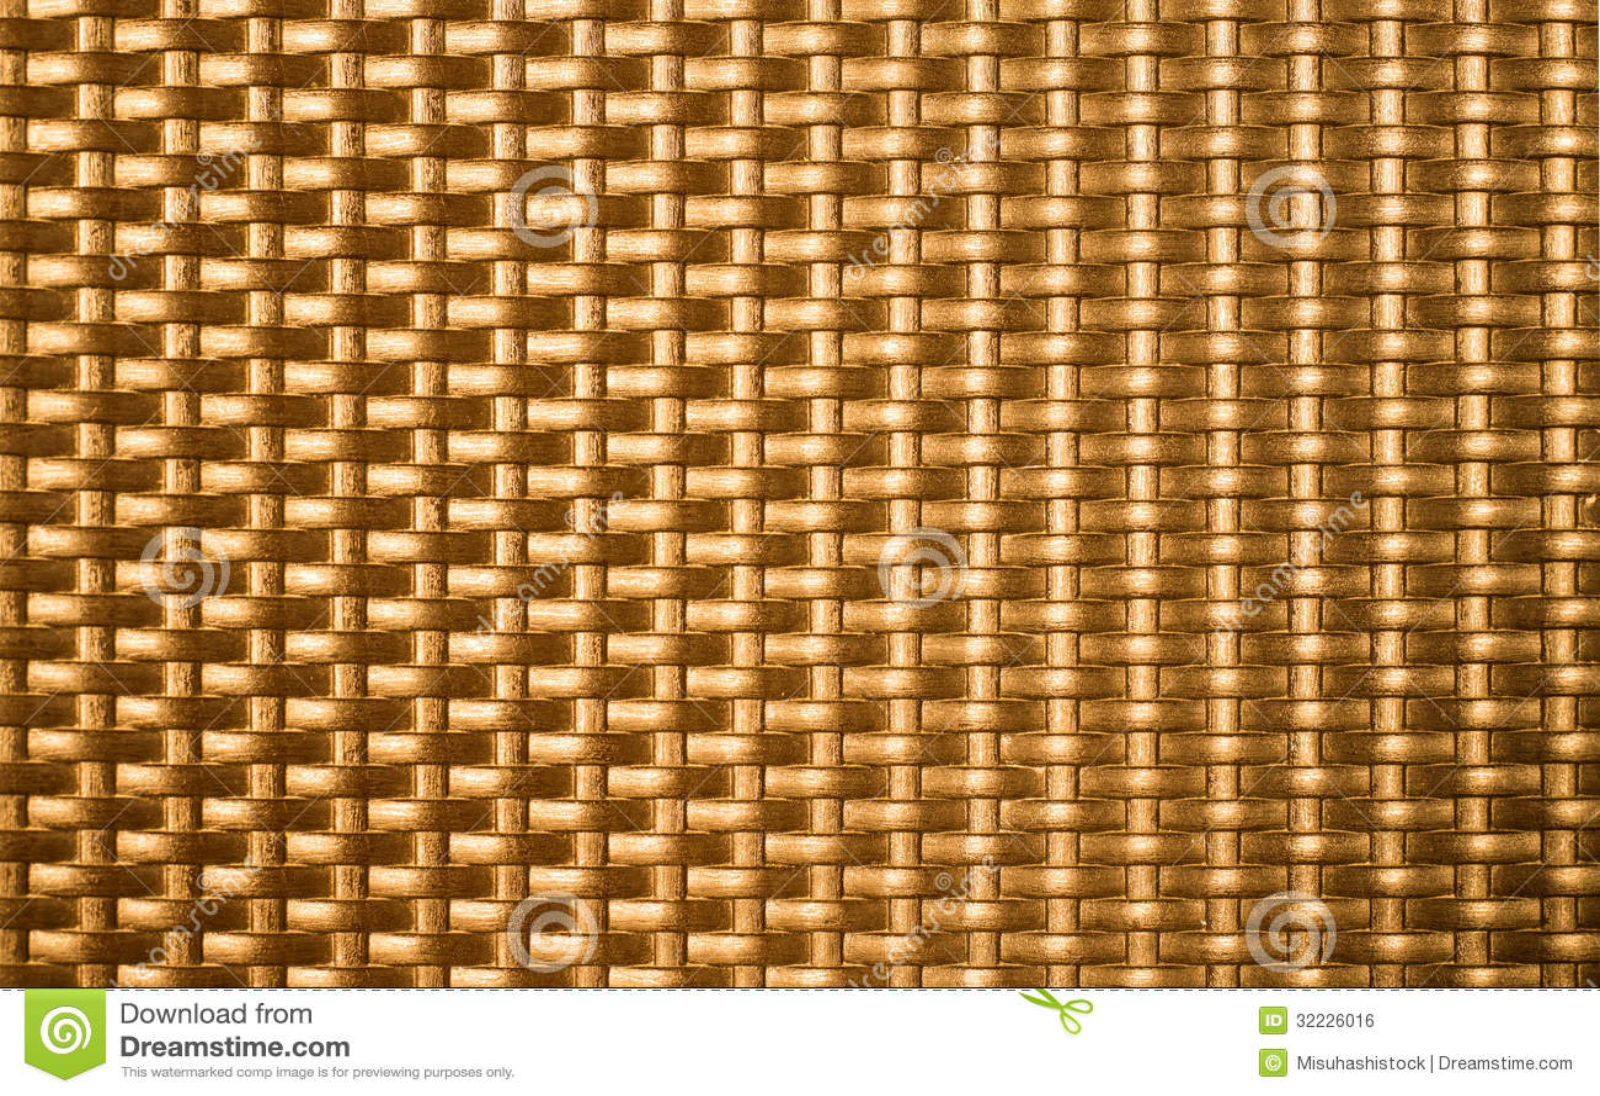 Download Weave dourado foto de stock. Imagem de naughty, crisscross - 32226016